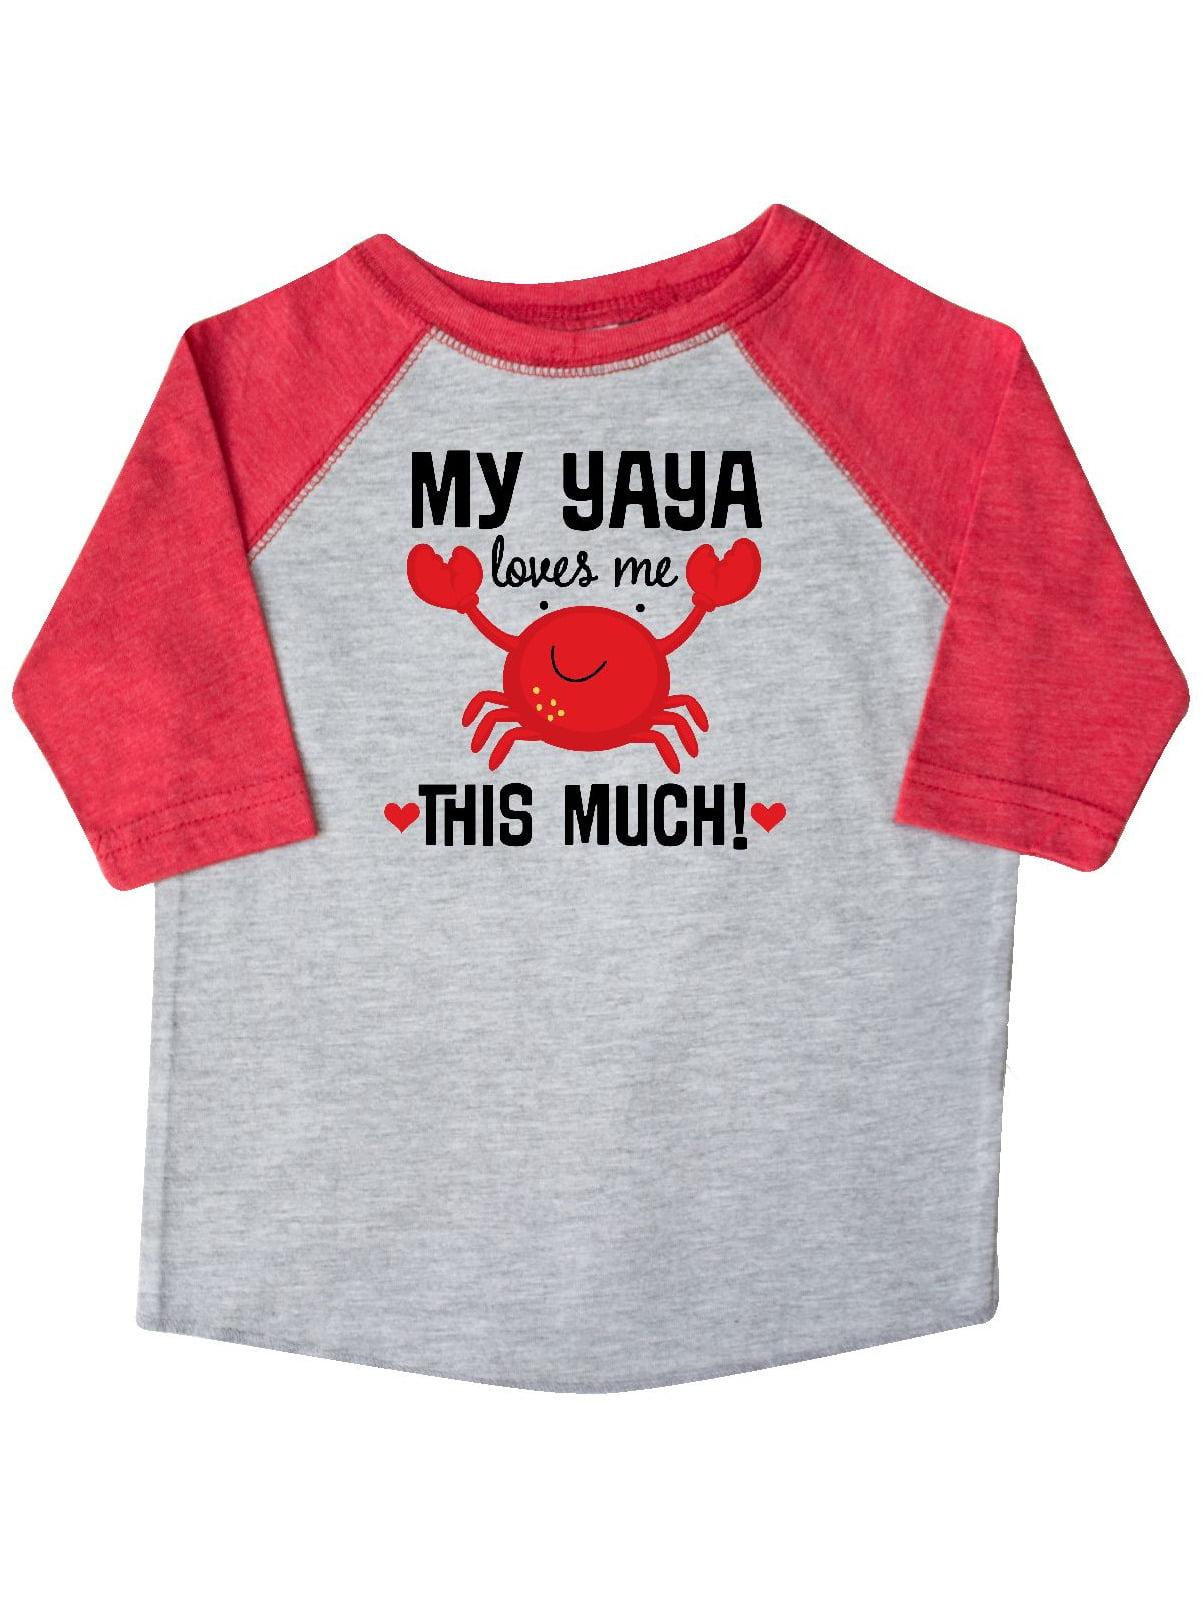 Yaya Loves Me Grandson Gift Toddler T-Shirt